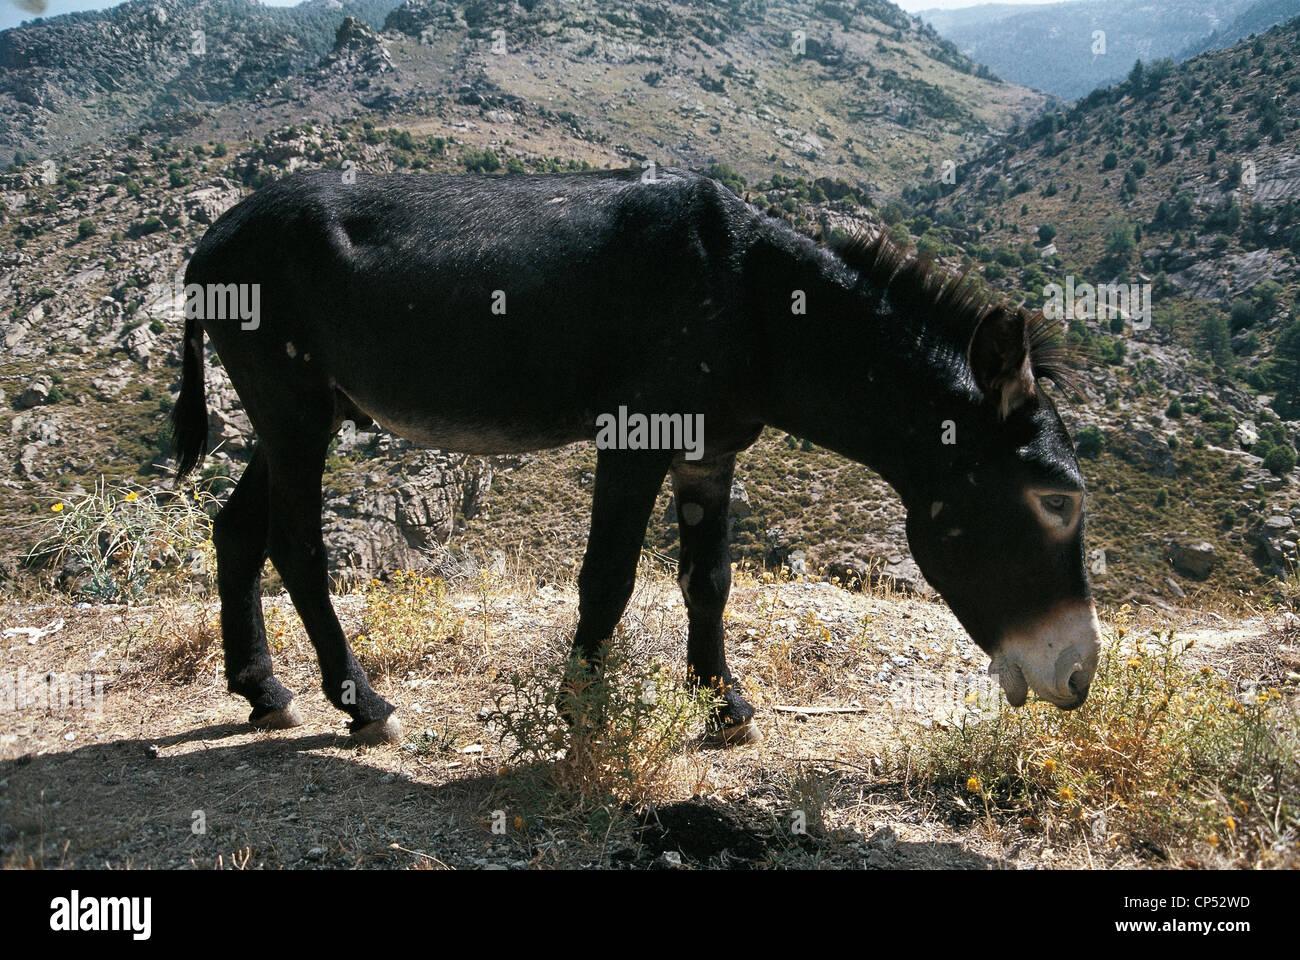 zoology - horses - big ass black berry (equus asinus). france stock